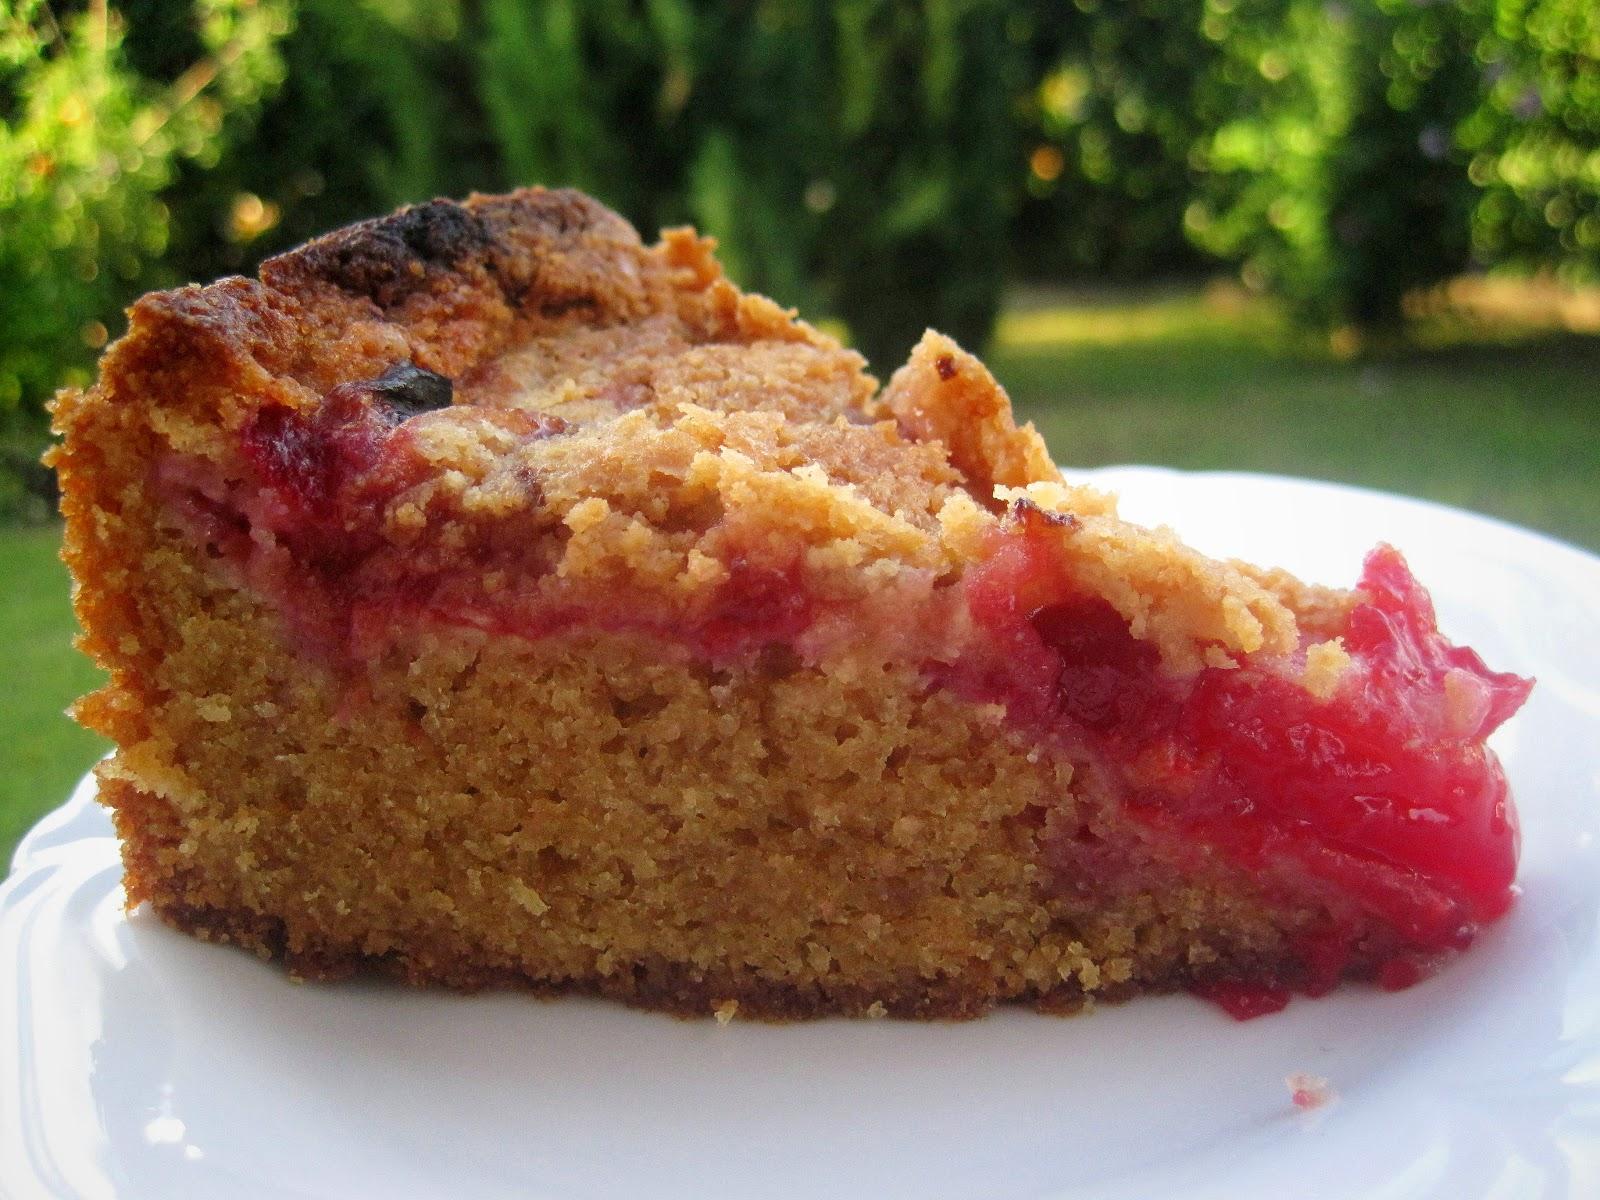 plum/prune cake